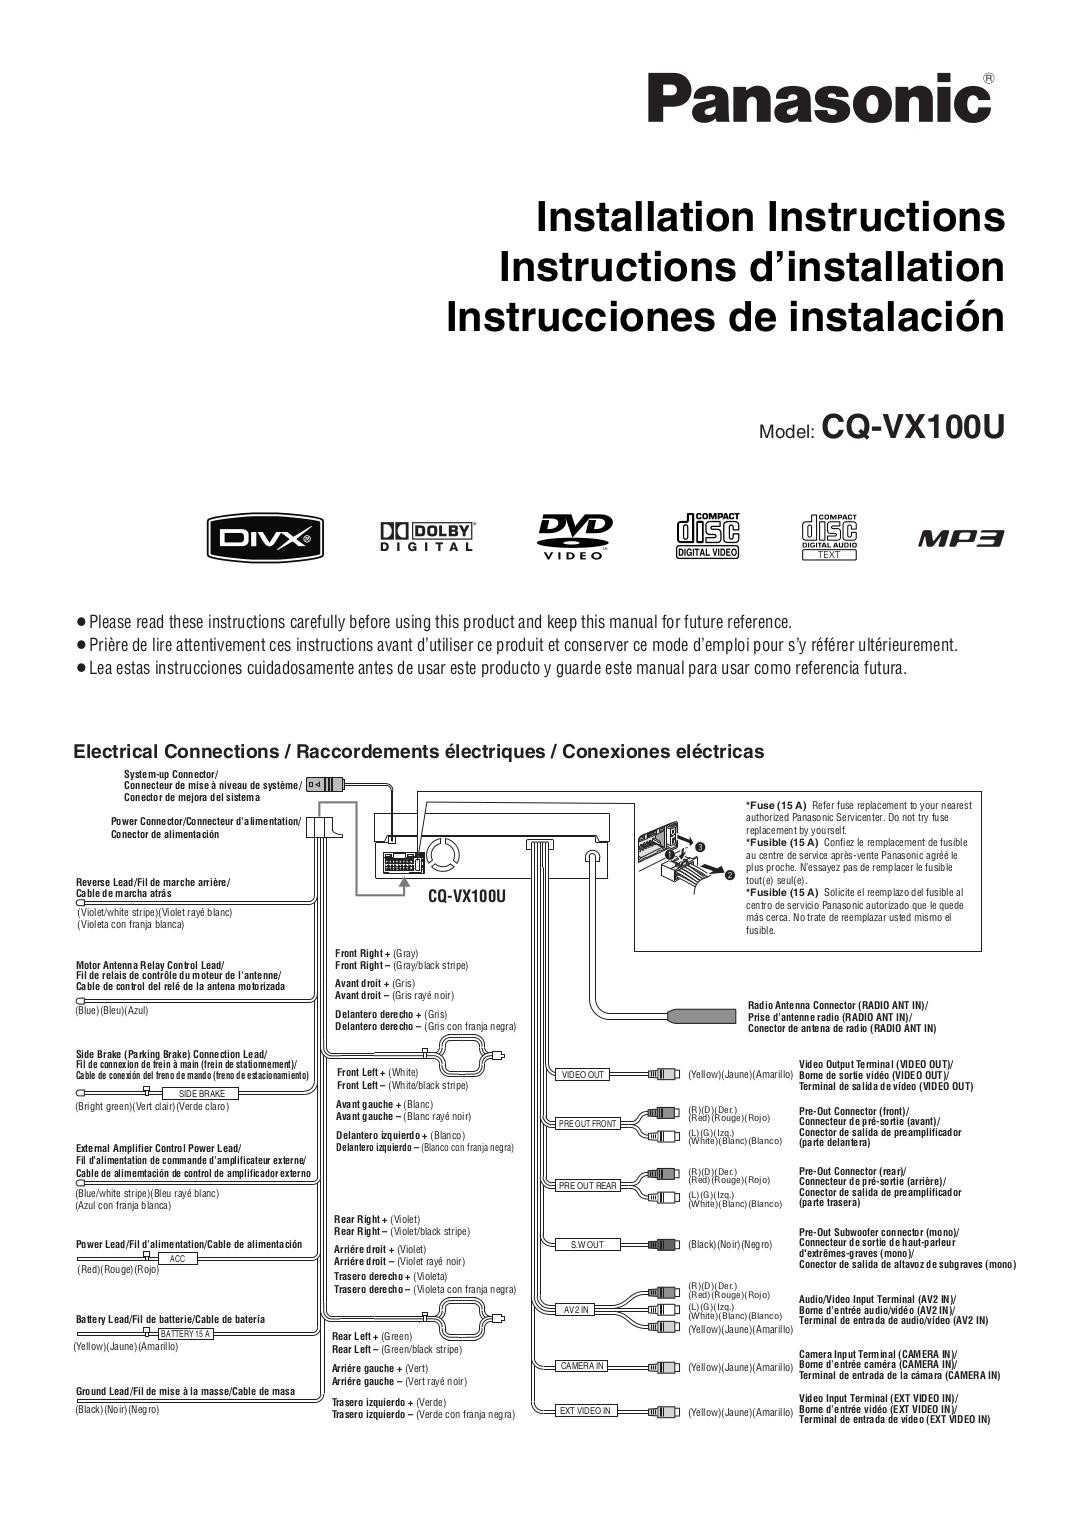 Panasonic Cq Vx100u Wiring Diagram Free Download Cqcp137u Pdf Manual For Car Video Radio Wire Colors At